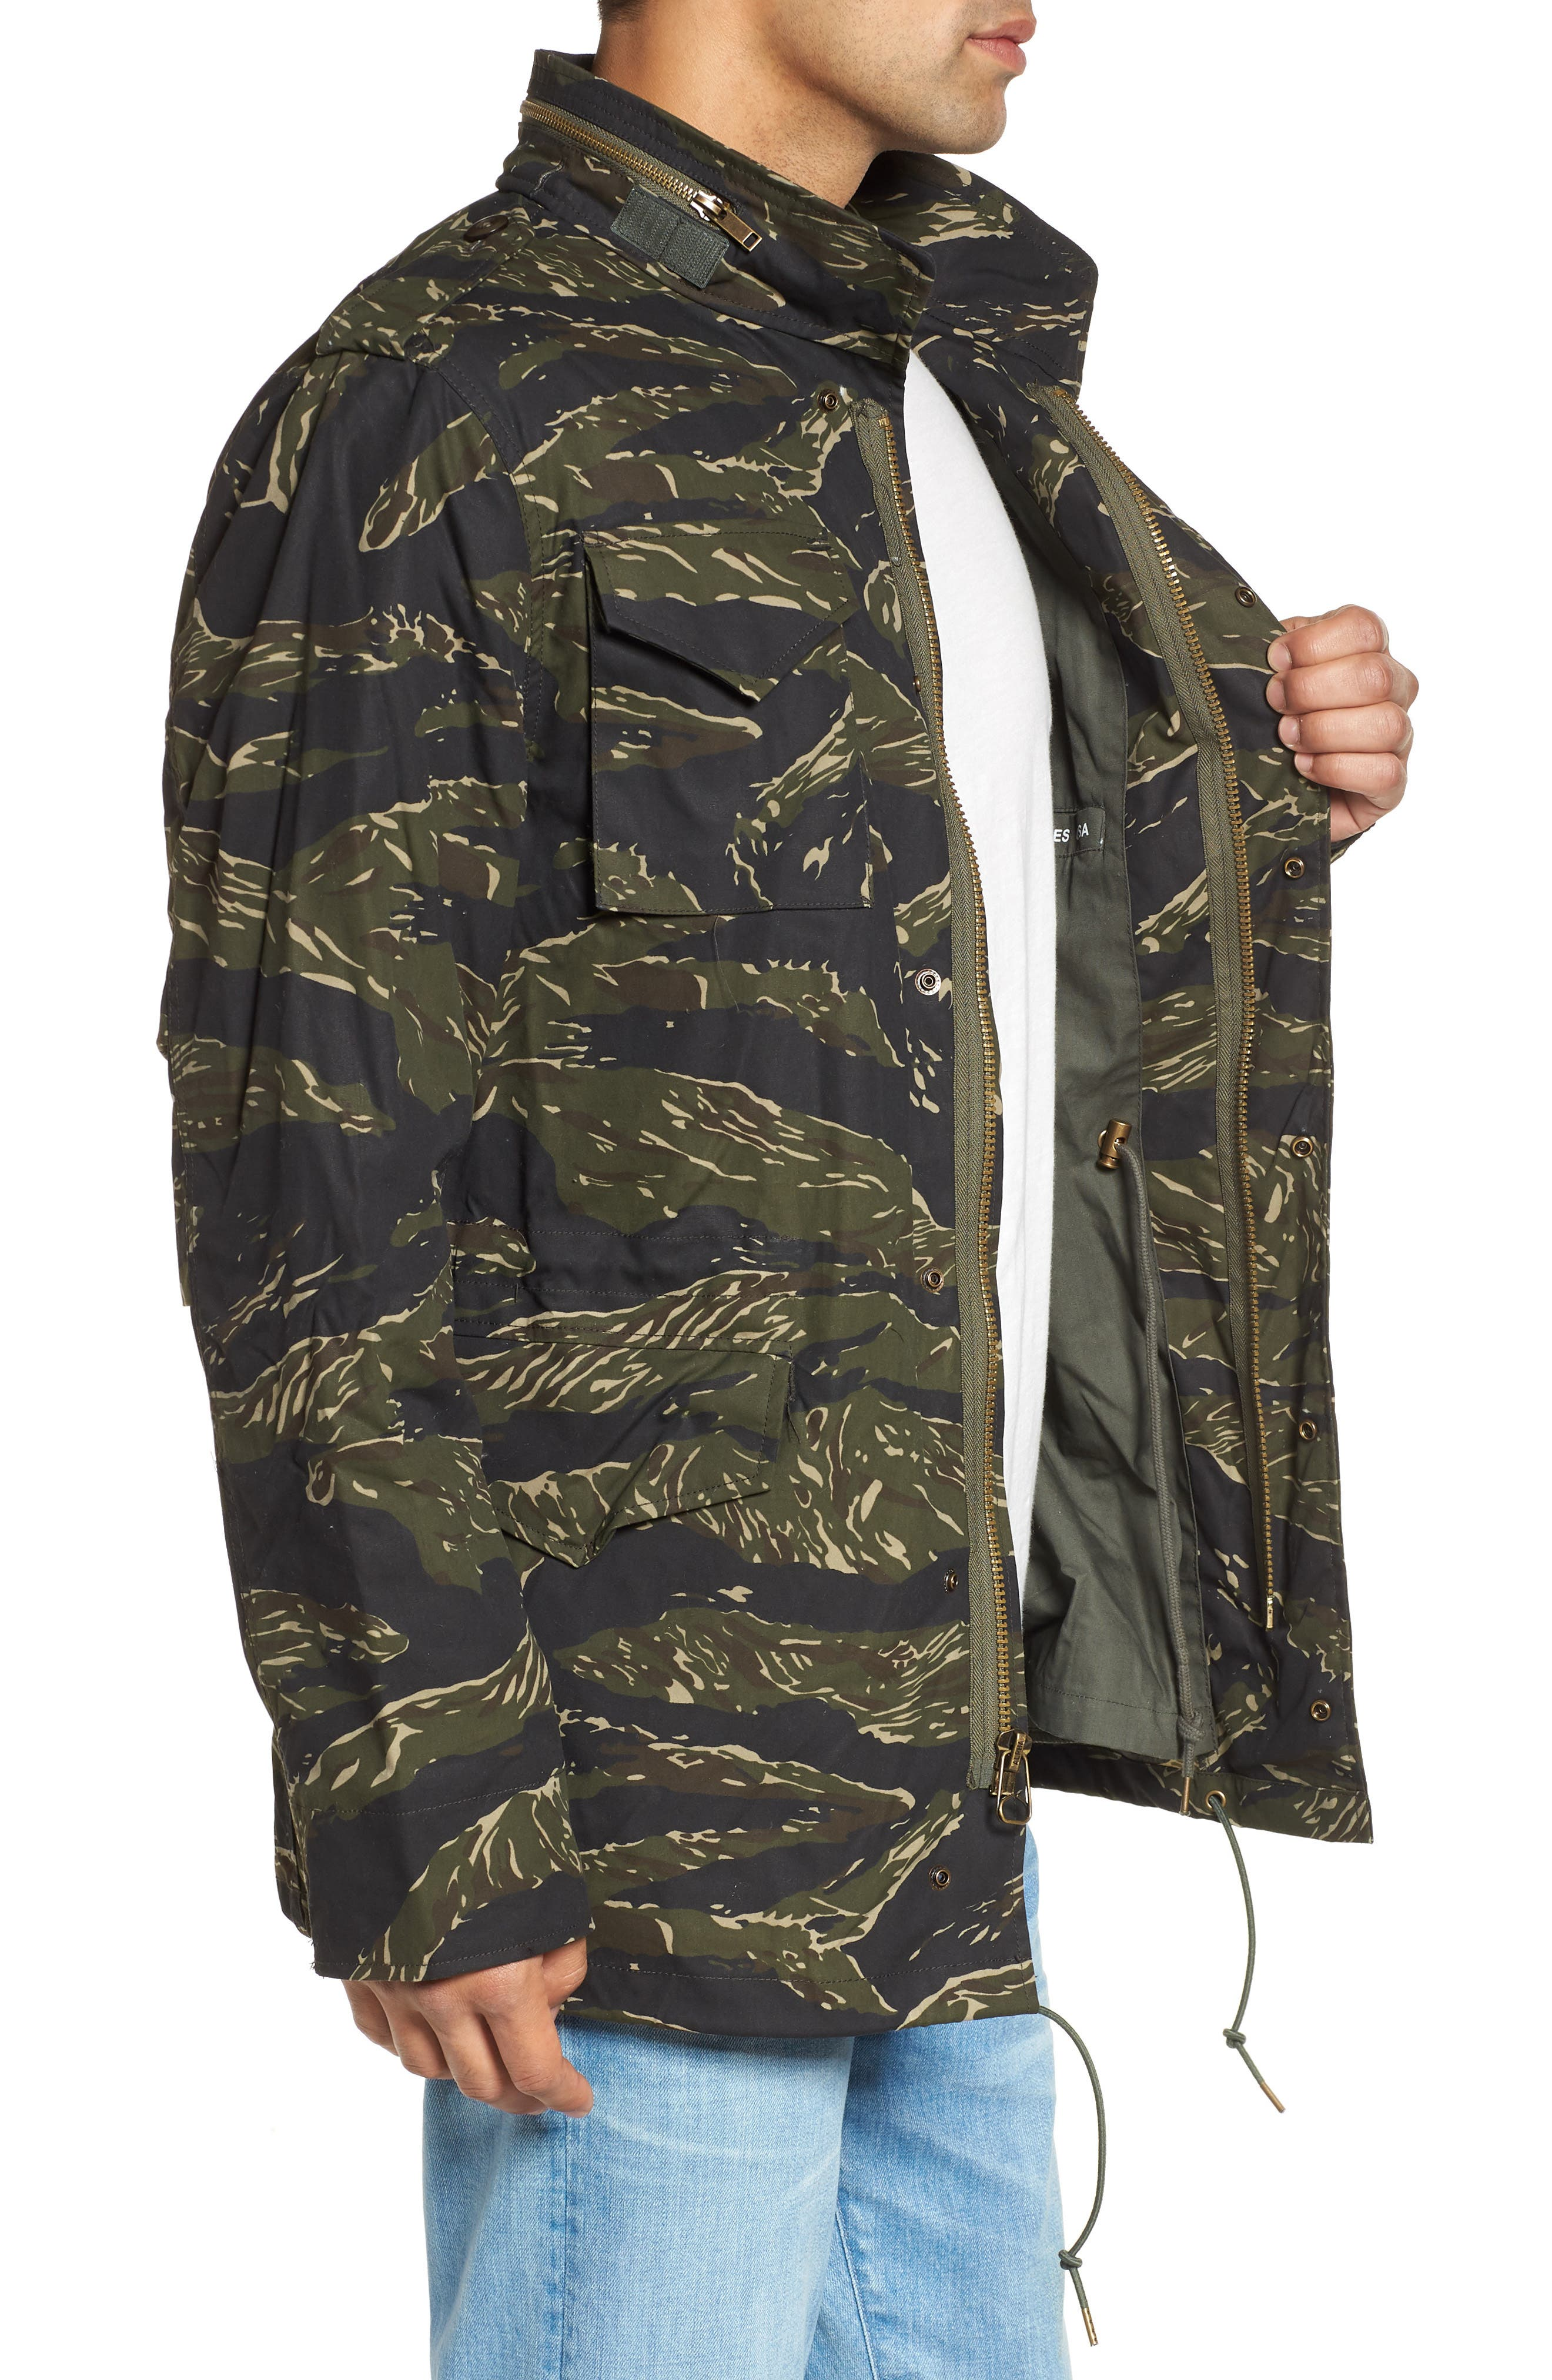 M-65 Defender Waxed Camo Field Jacket,                             Alternate thumbnail 3, color,                             TIGER CAMO